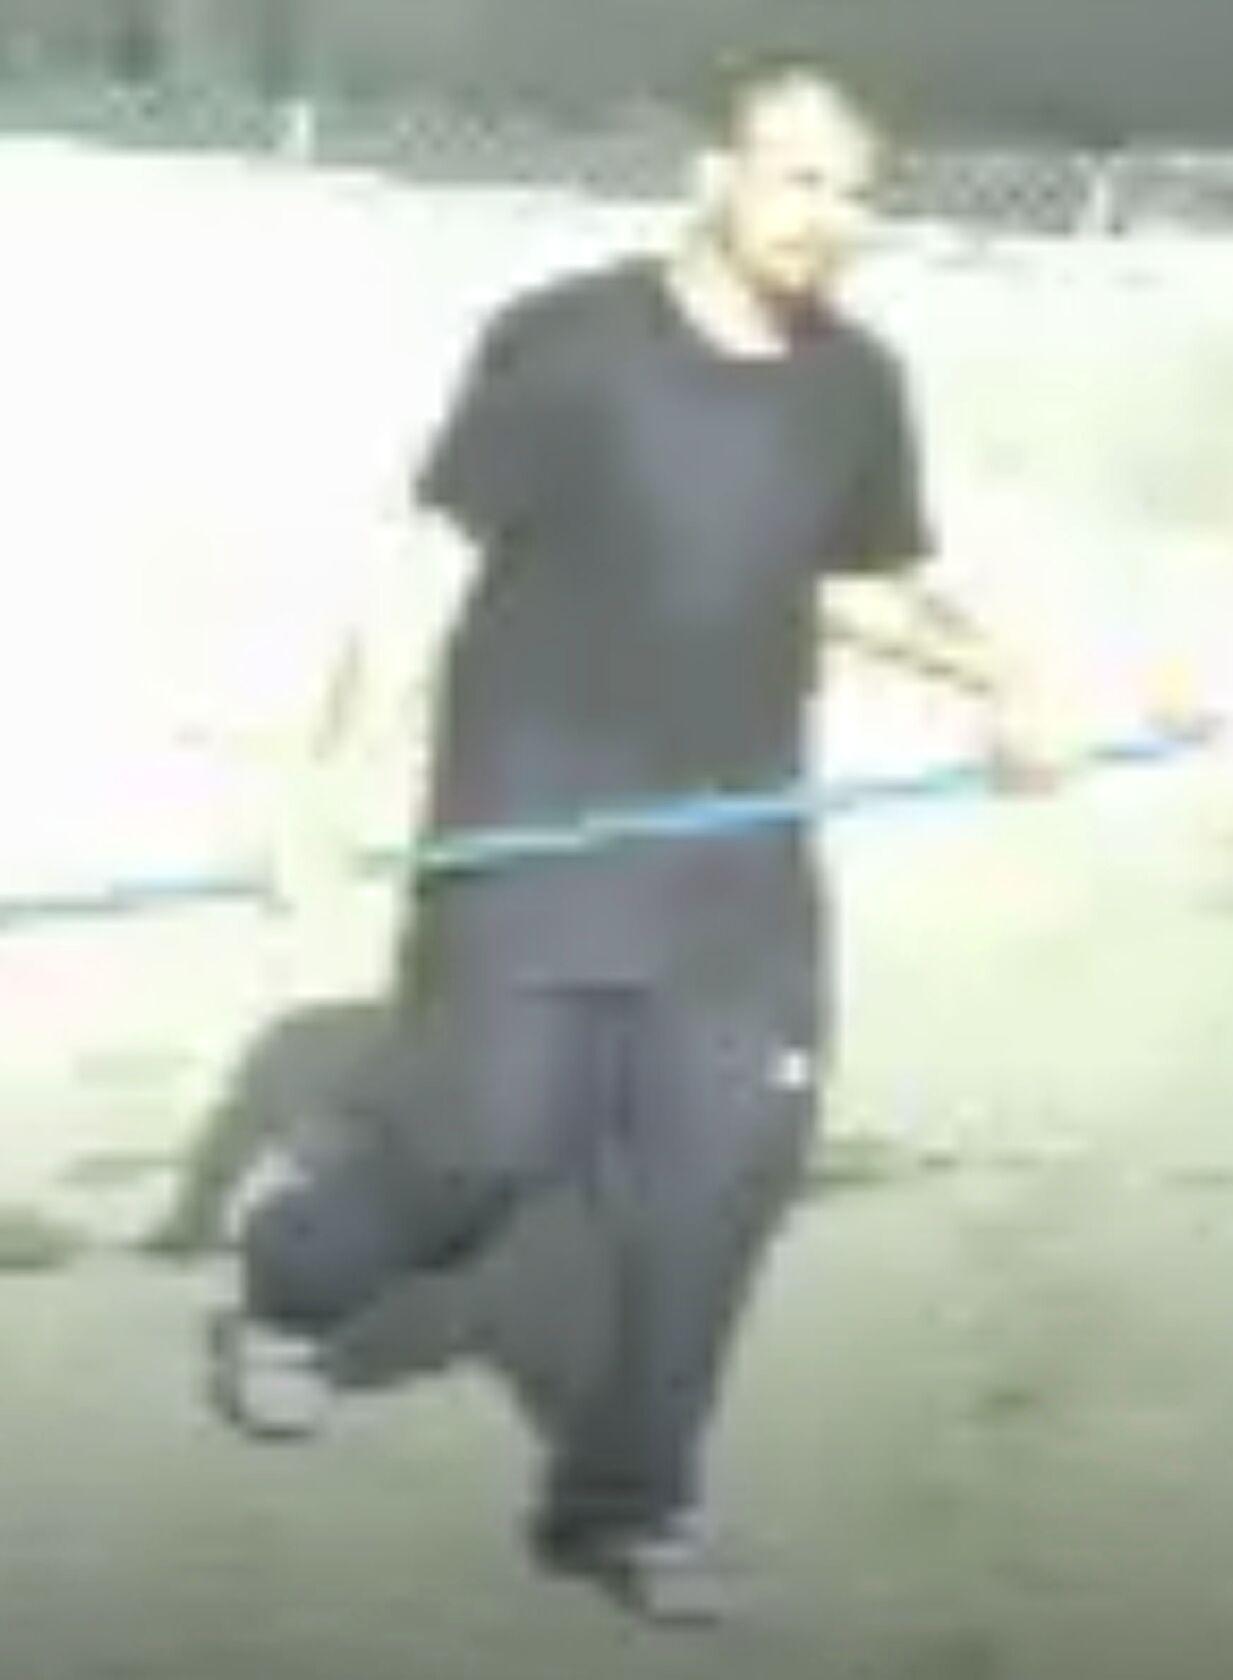 042821_MNS_Custer_burglary_002 Custer Avenue burglary suspect